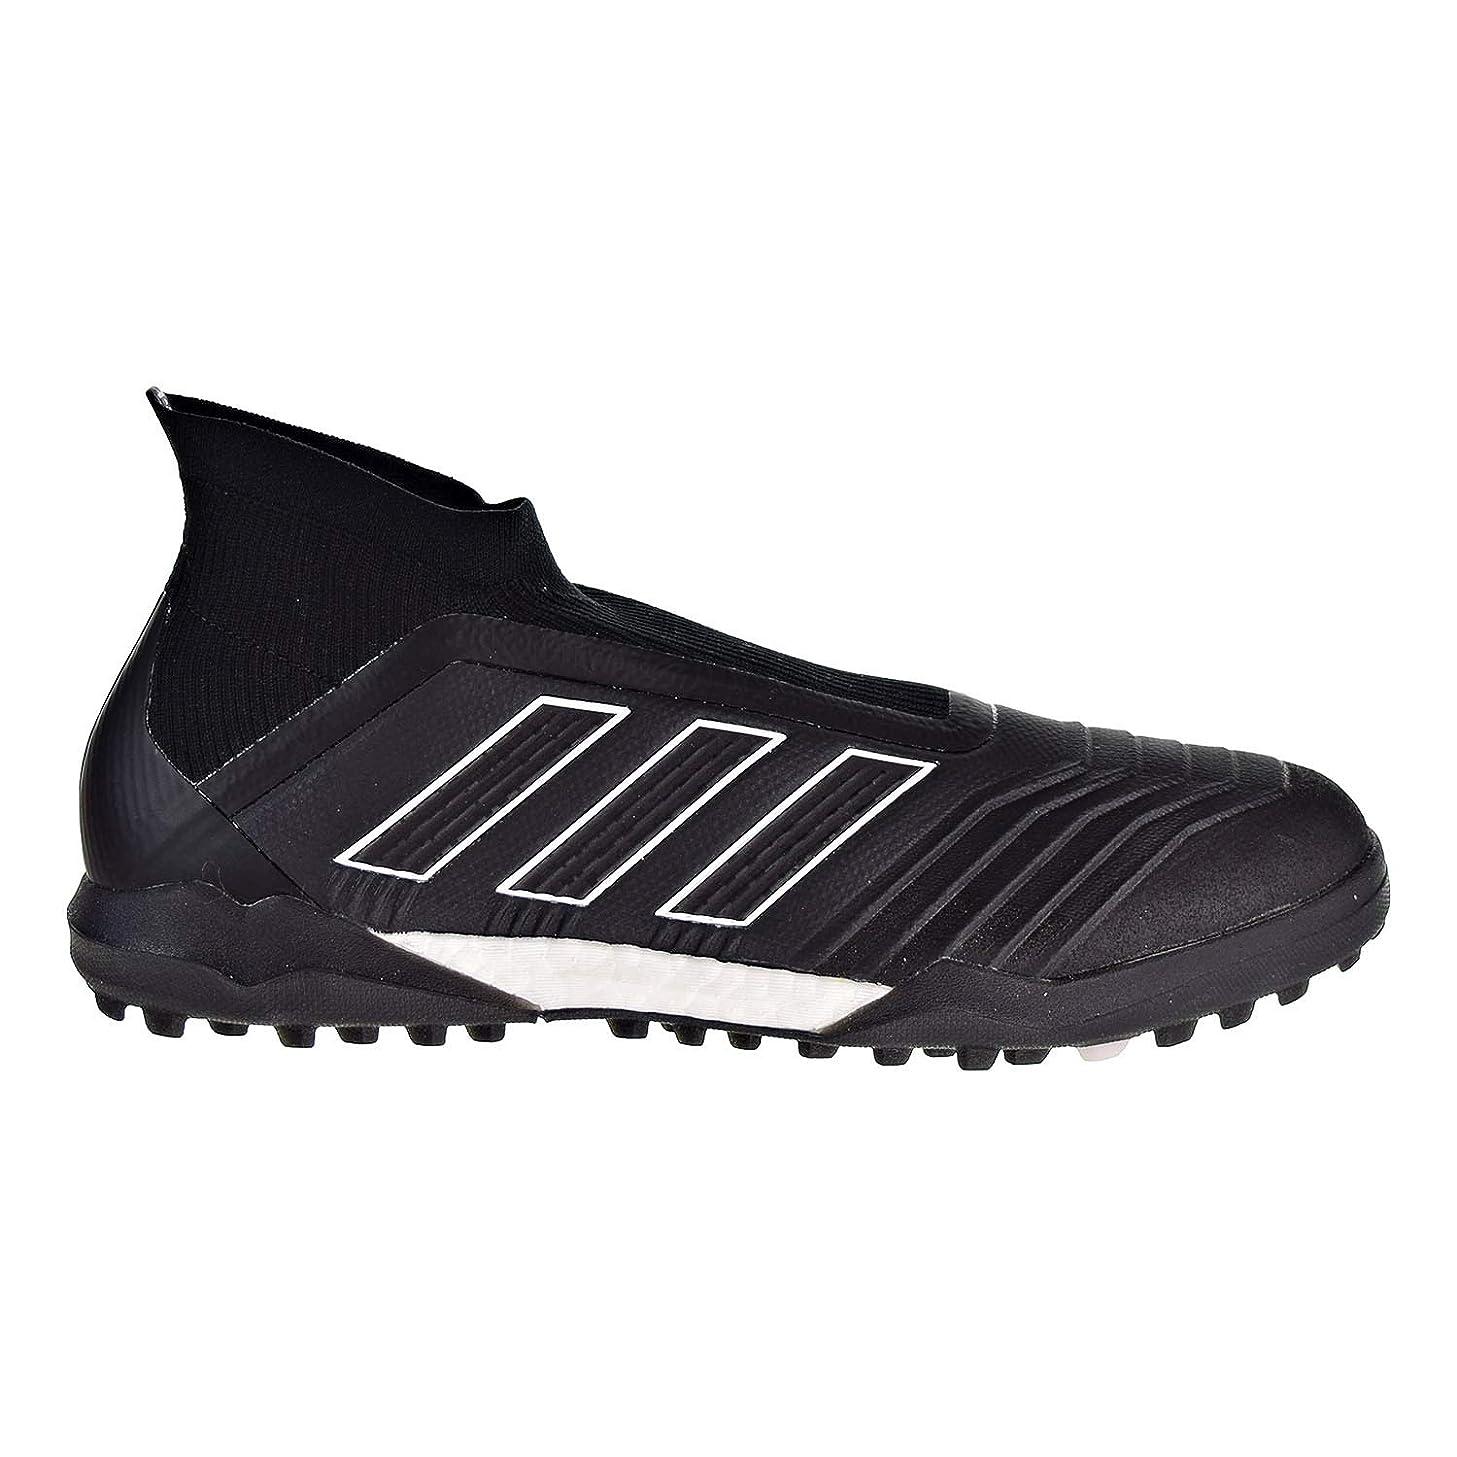 adidas Predator Tango 18+ Turf Cleats Men's Shoes Core Black db2057 (8.5 D(M) US)